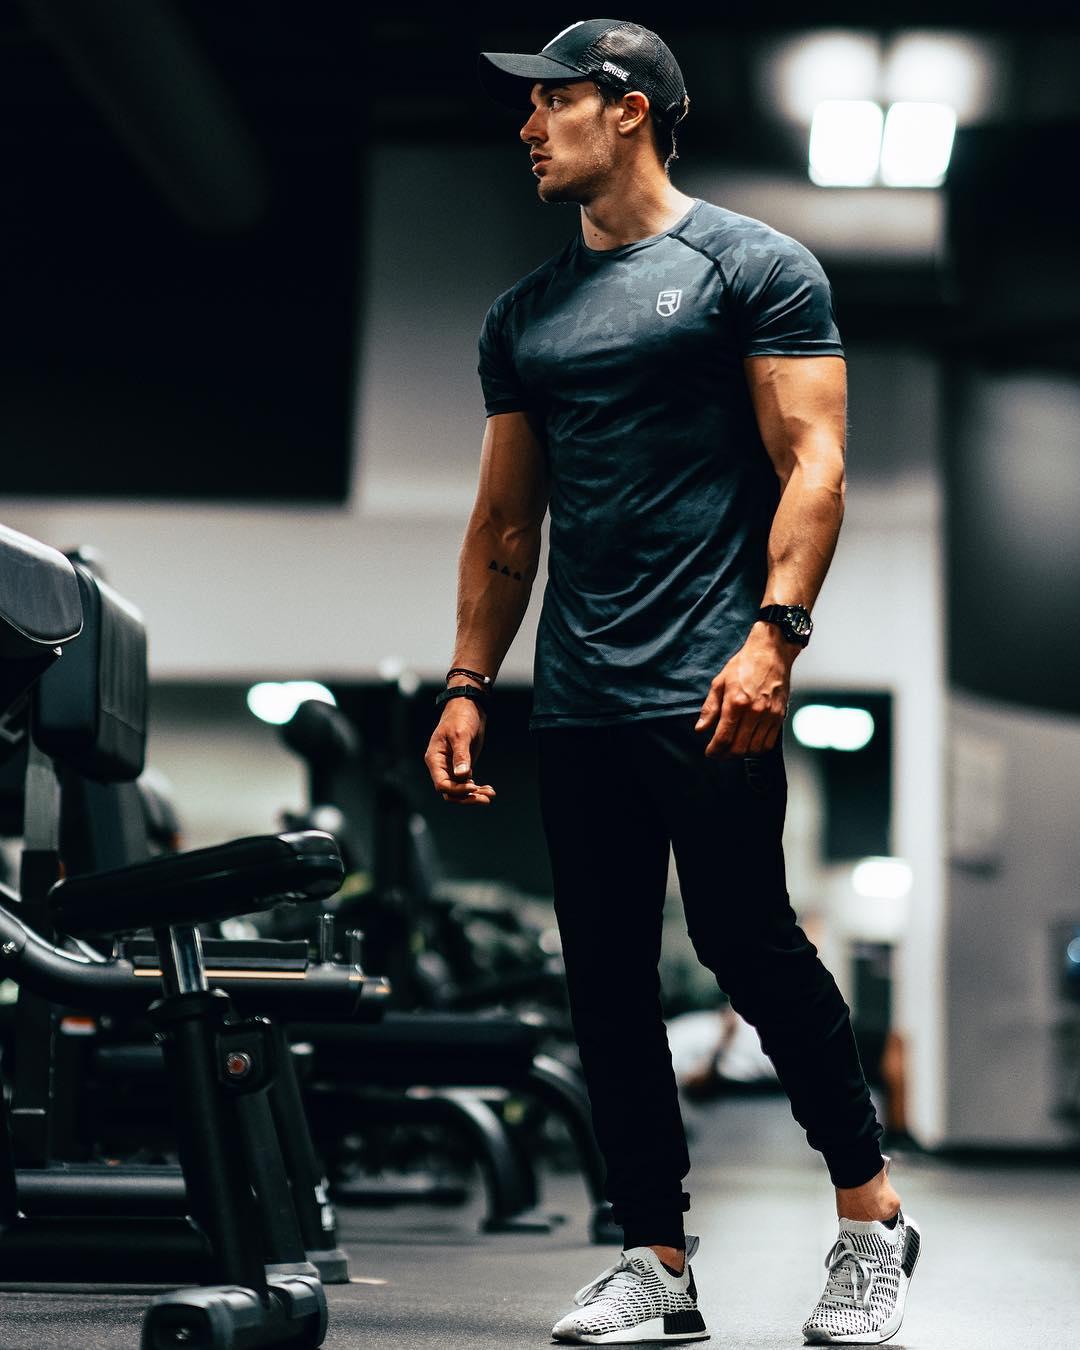 Trainingsschema spiergroei: een schema voor optimale spiermassa MAN MAN